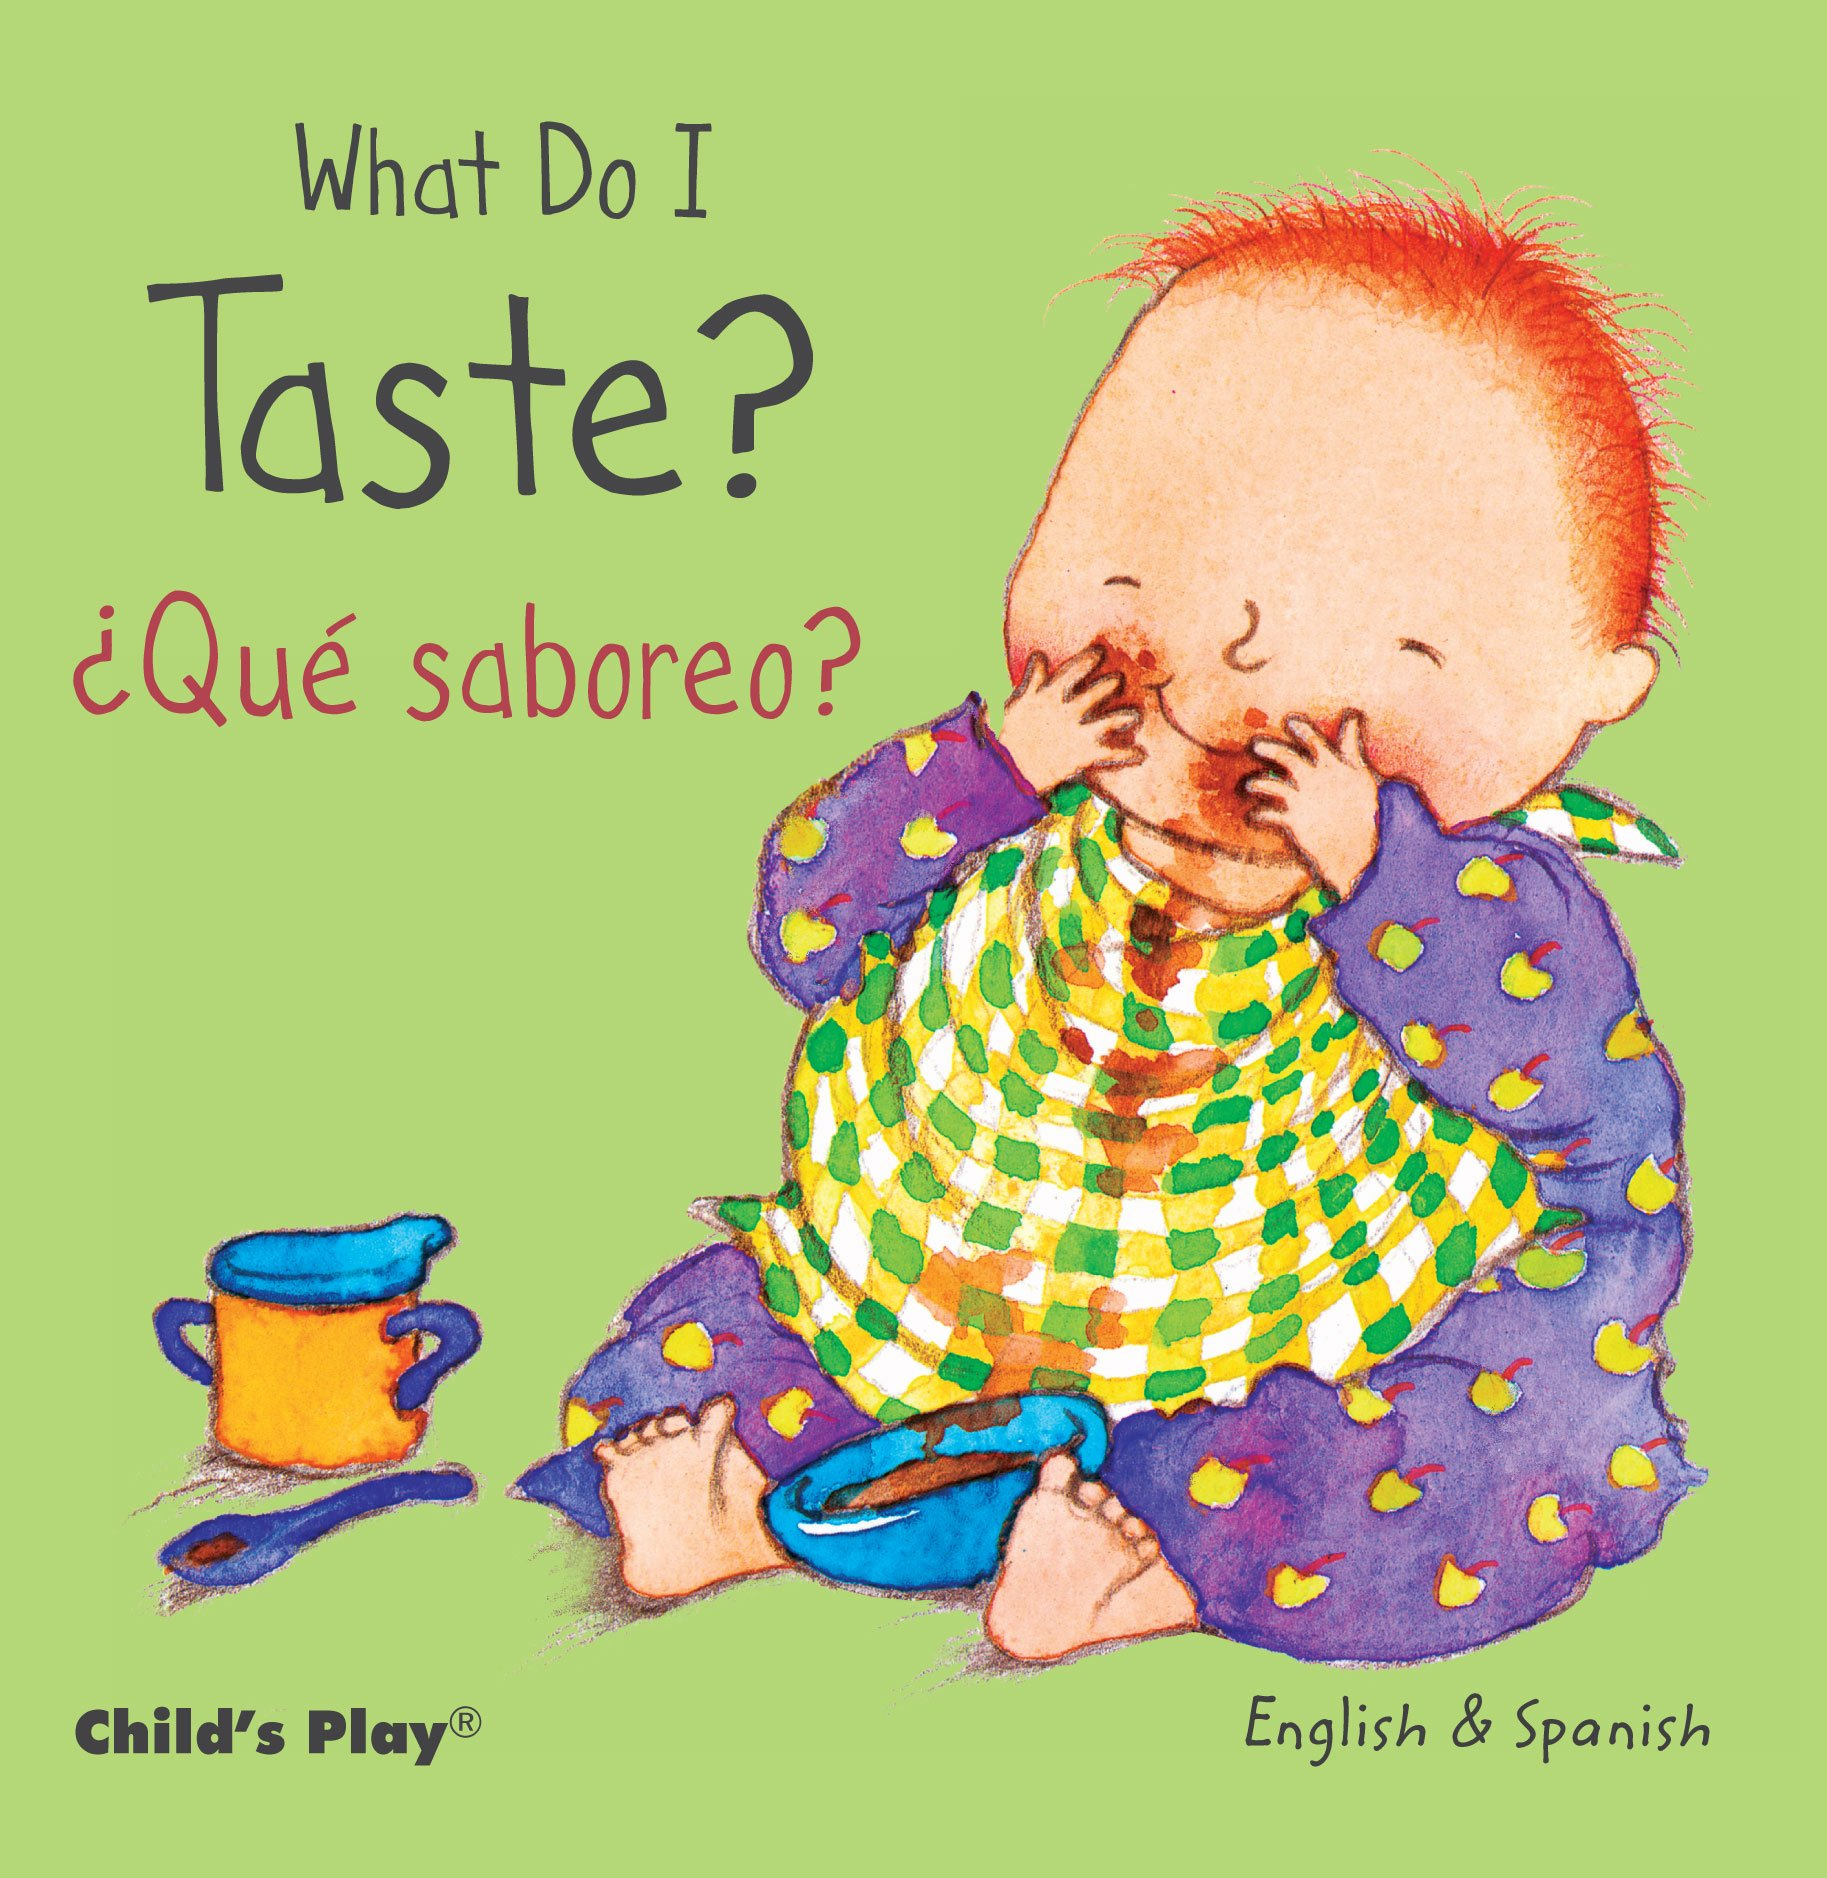 What Do I Taste? / ¿Qué saboreo? (Child's Play - Bilingual Titles) (Inglés) Libro de cartón – 1 abr 2015 Annie Kubler Teresa Mlawer 1846437229 Board books